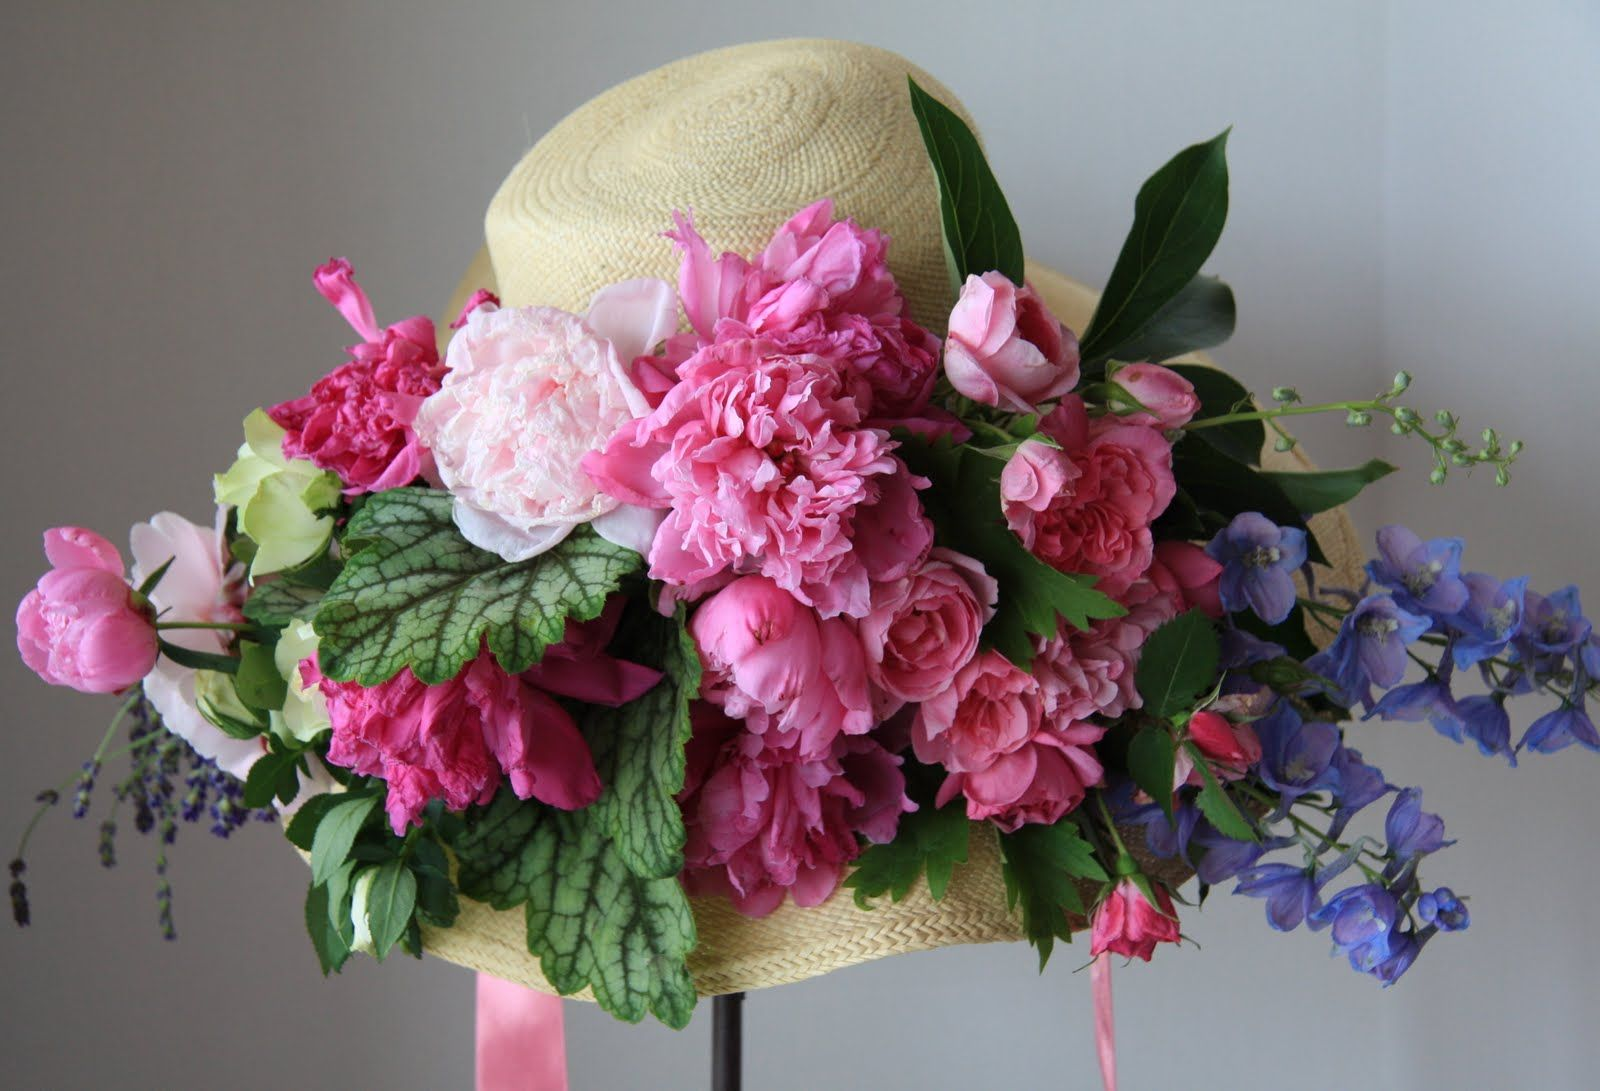 Glass Stunning Bonnet Crystal Flower Basket Outstanding Features Decorative Arts